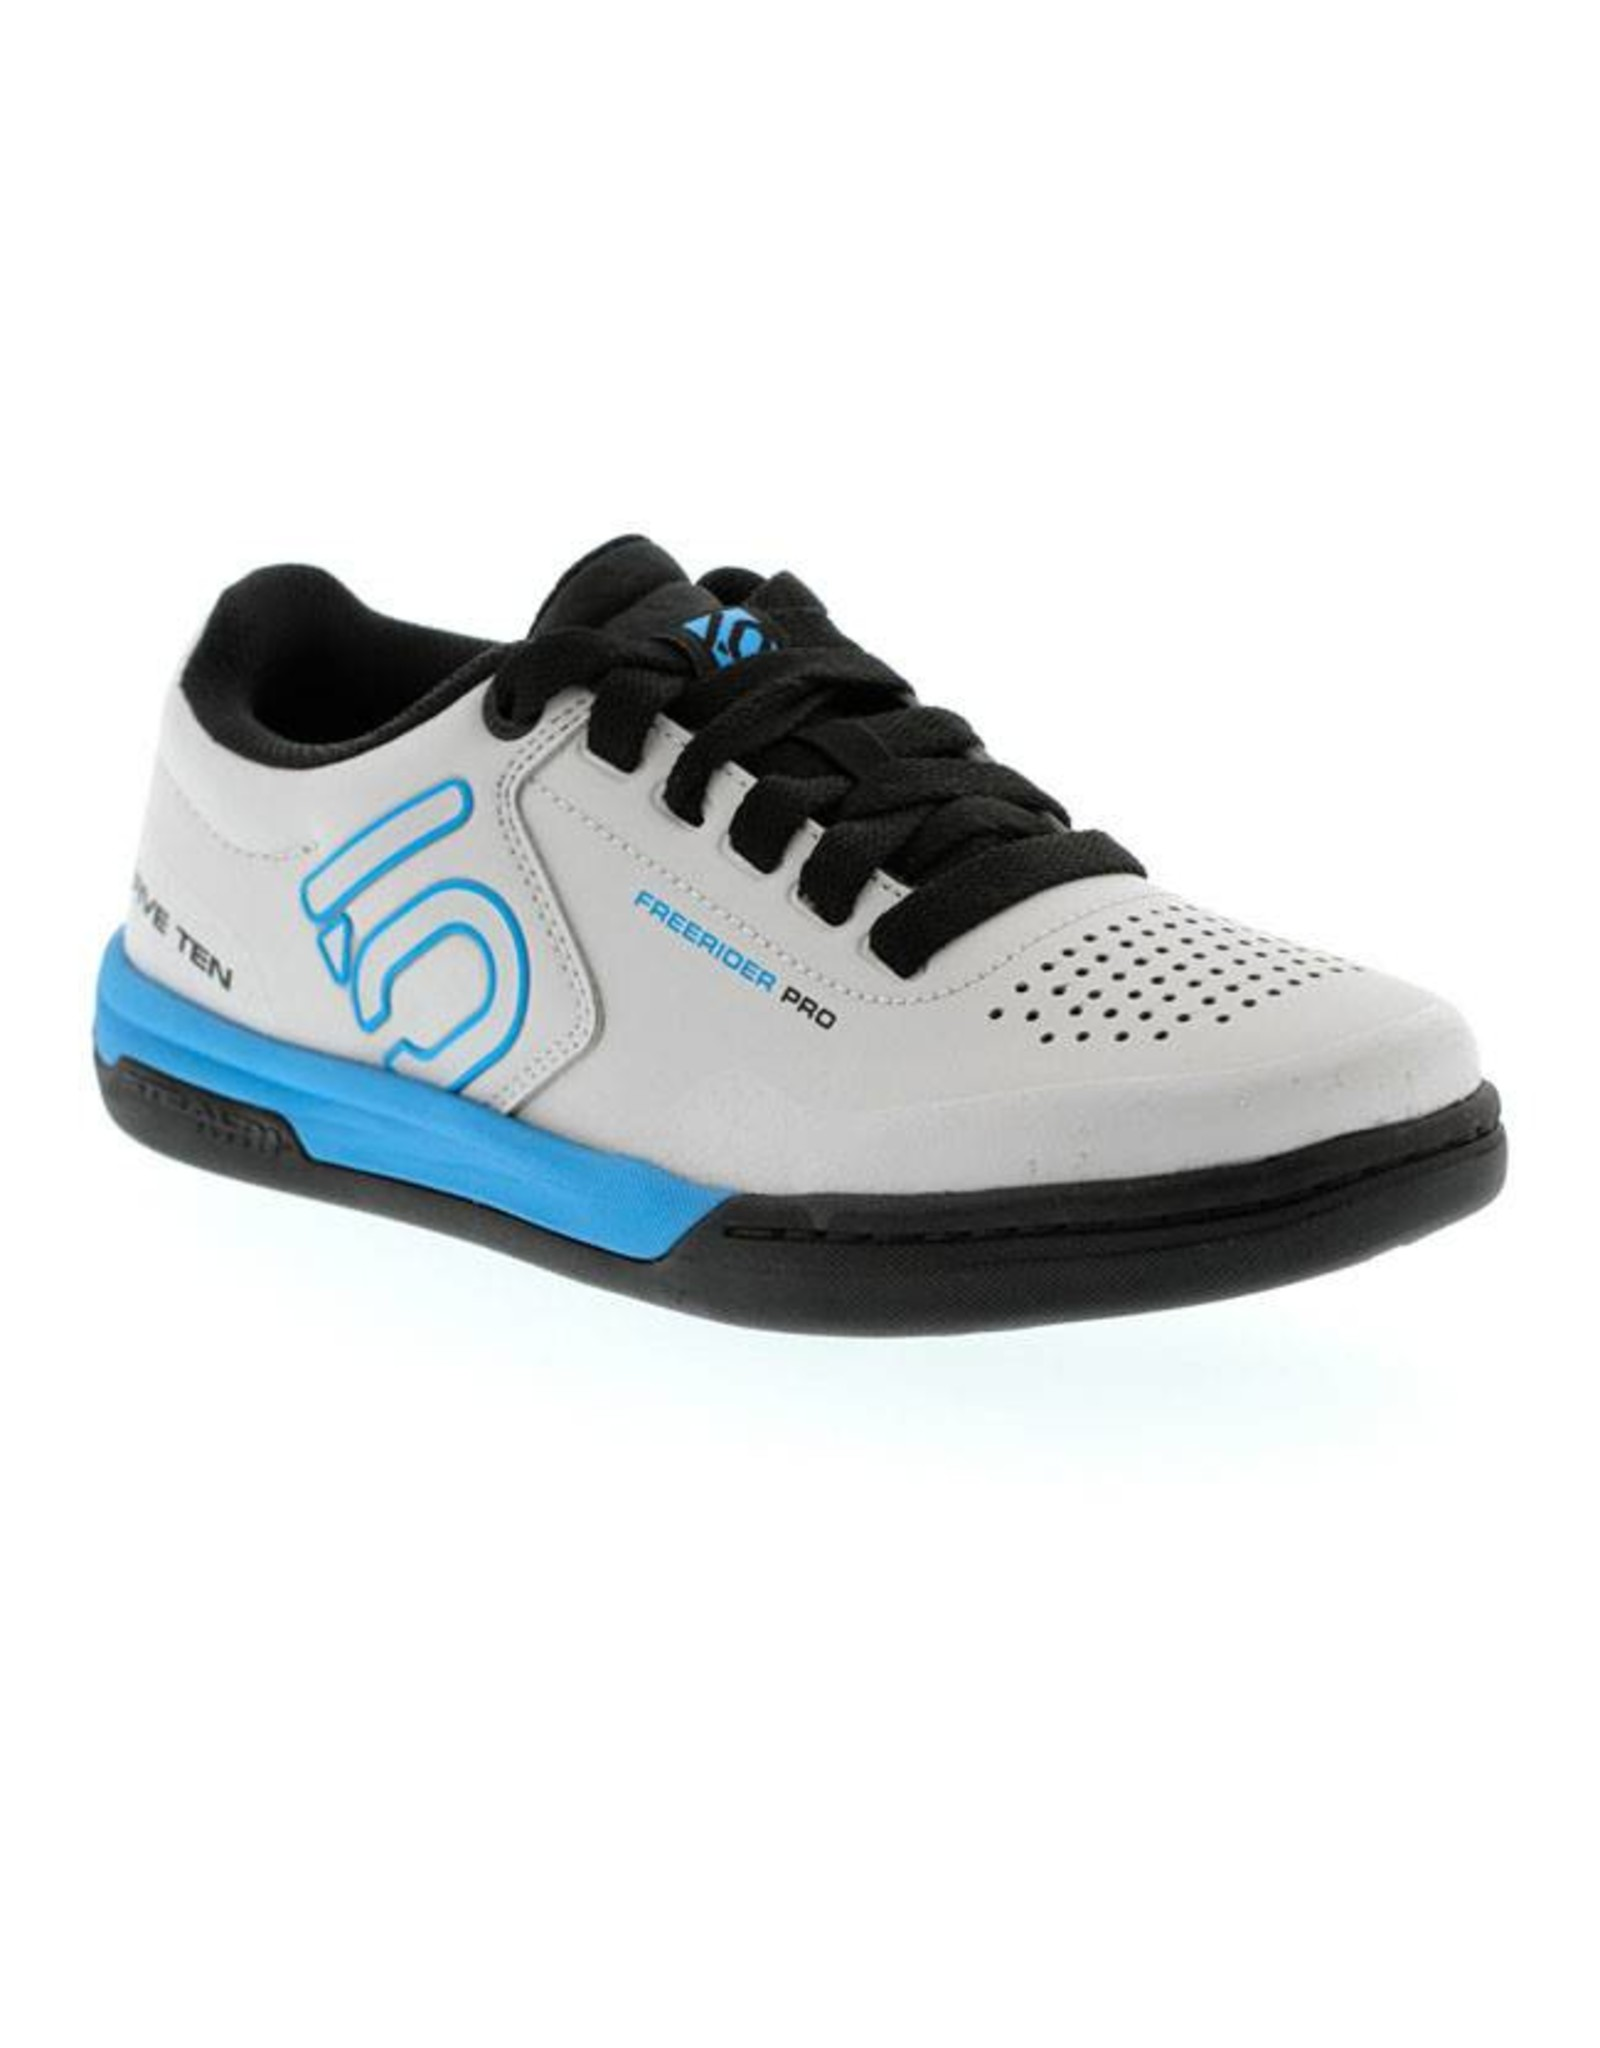 Five Ten Five Ten Freerider Pro Women's Flat Pedal Shoe: Solid Gray 6.5